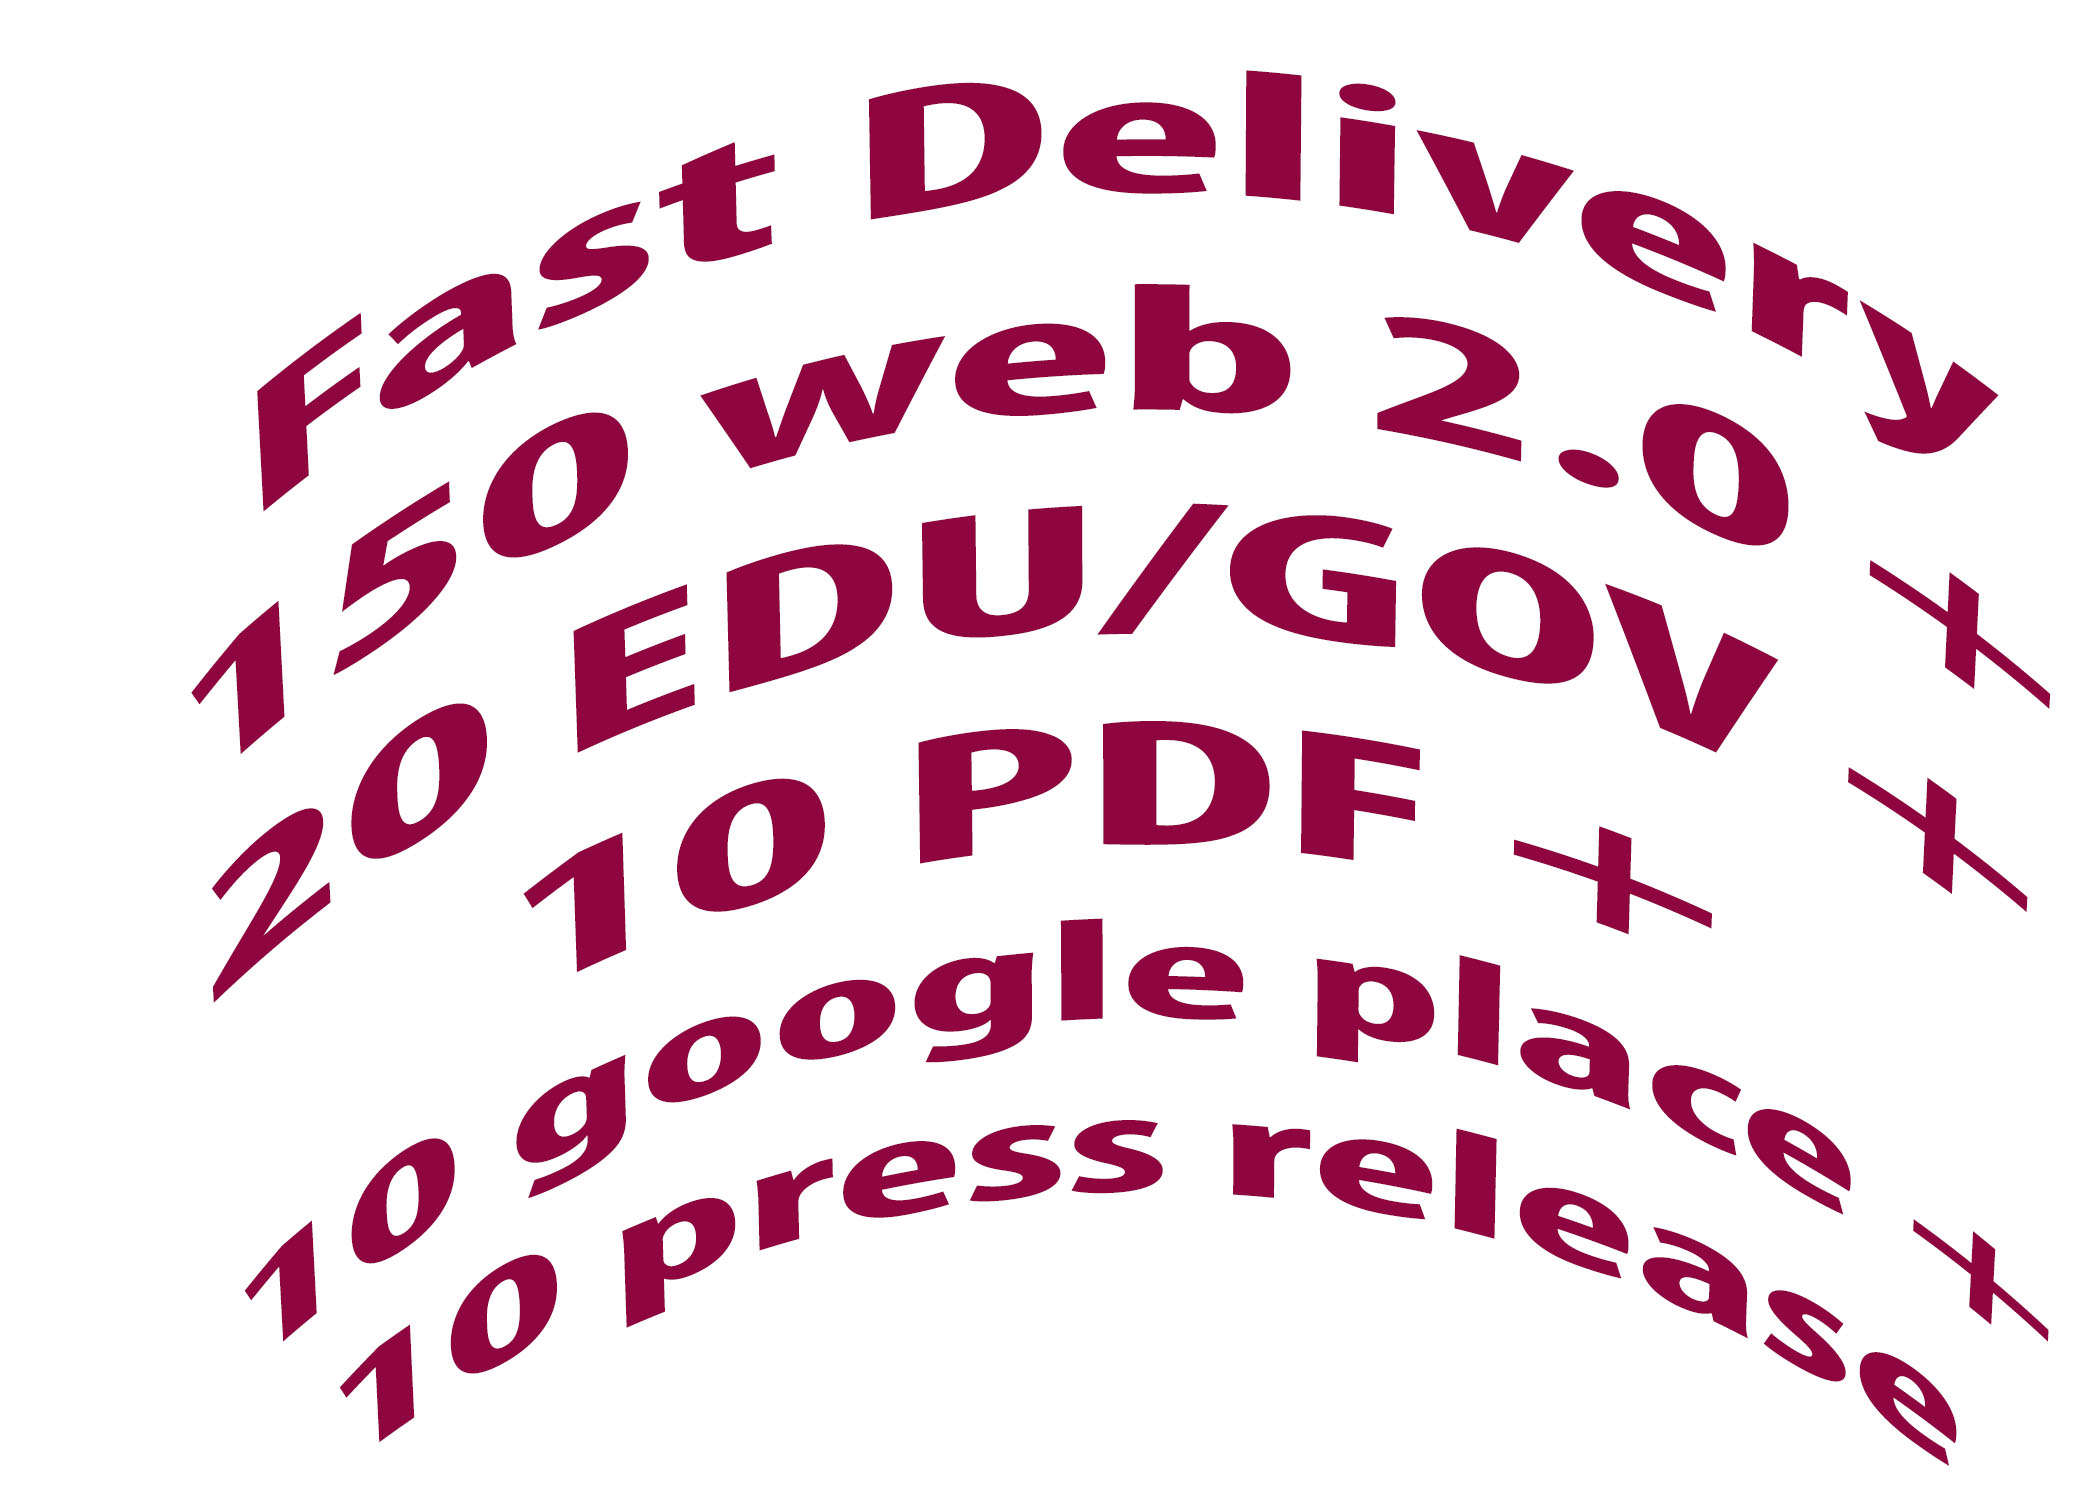 DA 80+ 150 web 2.0 + 20 EDU/GOV + 10 PDF + 10 google place + 10 press release